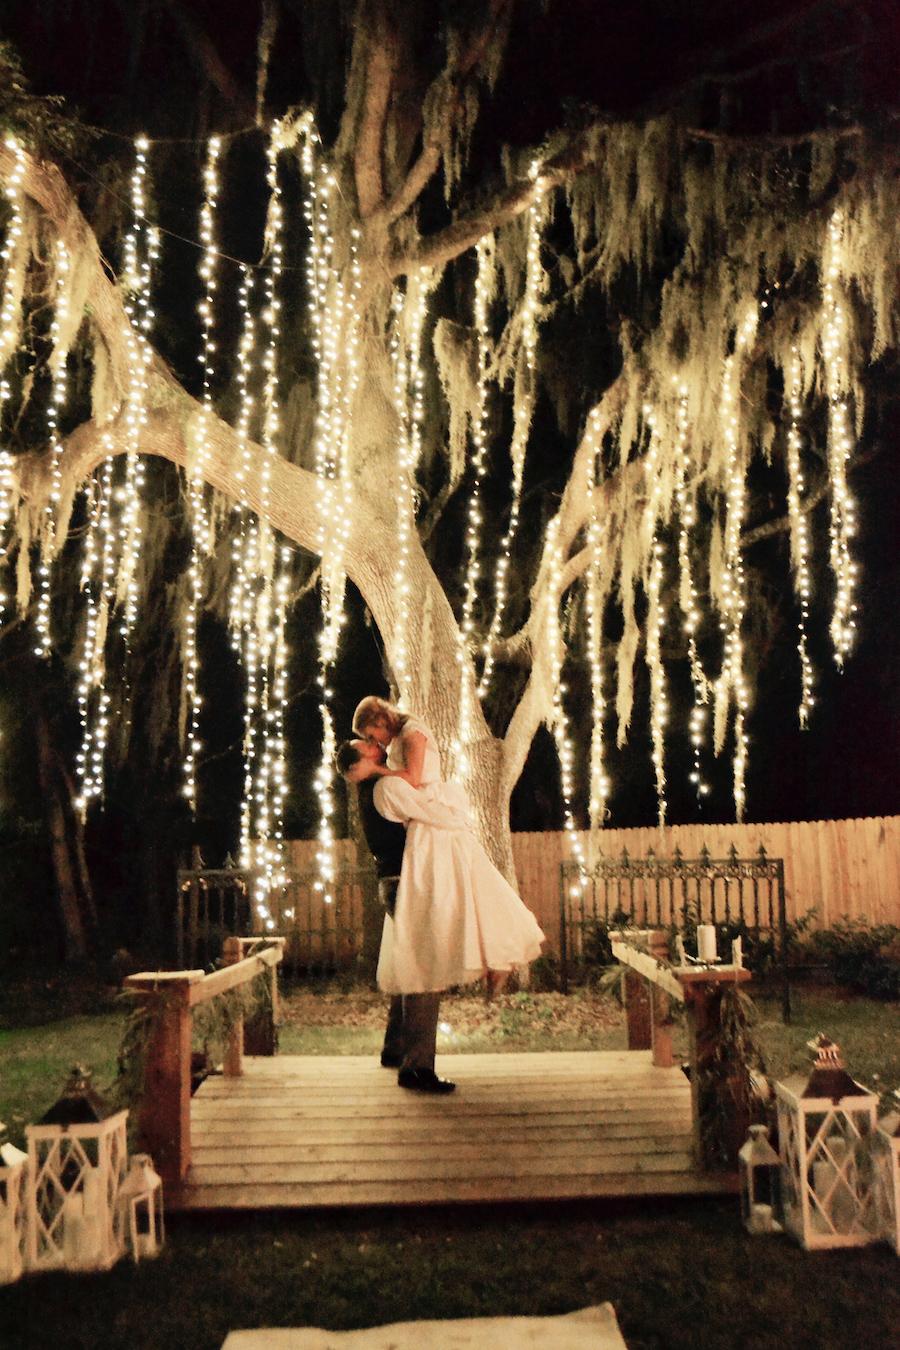 Sarasota Outdoor Bride and Groom Nighttime Portrait on Wedding Day   Sarasota Wedding Venue Bakers Ranch